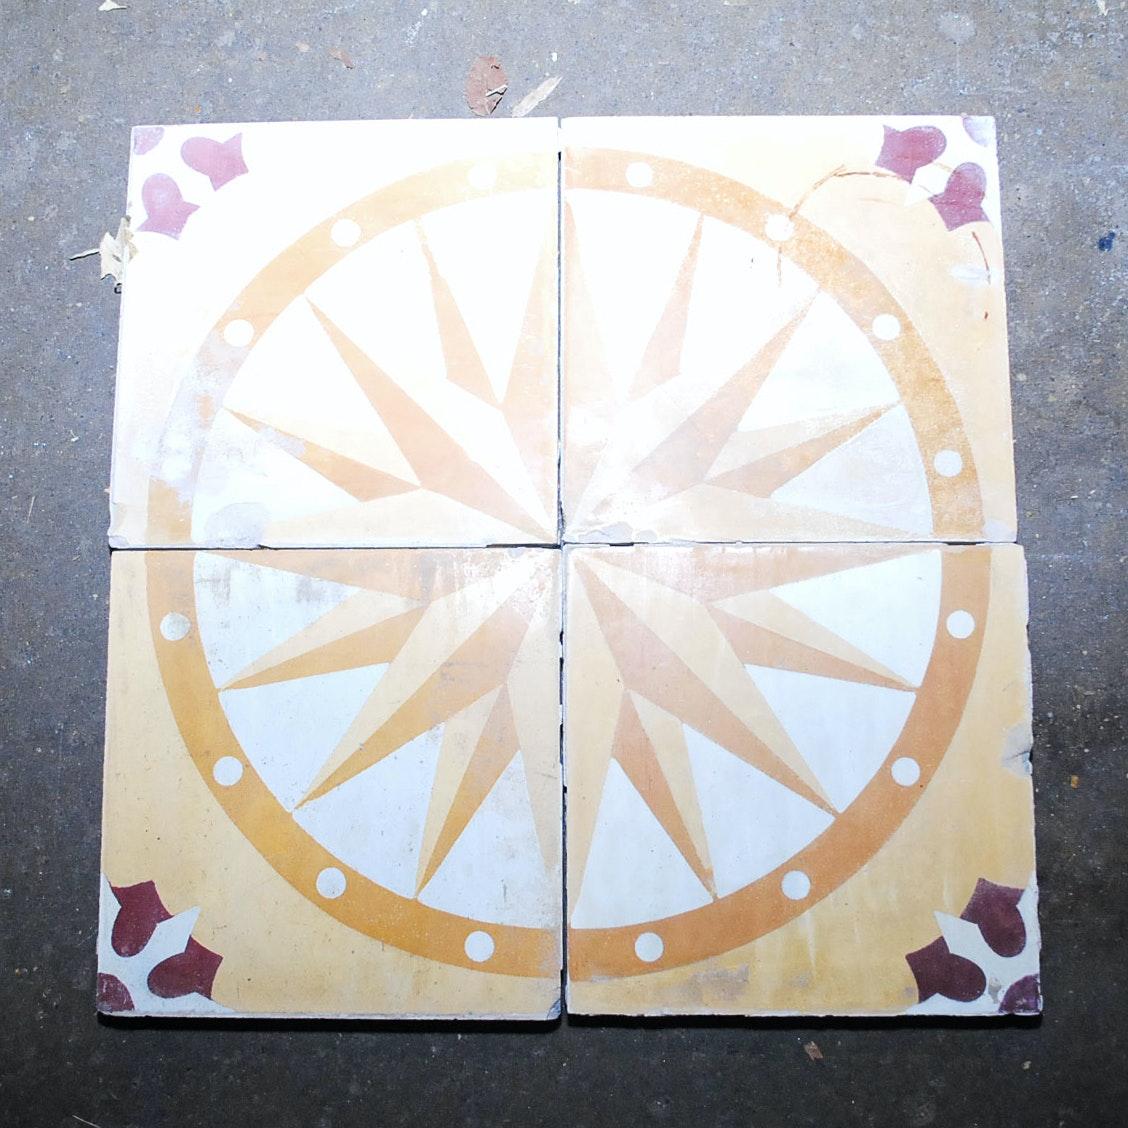 European Style Decorative Hand Painted Tiles